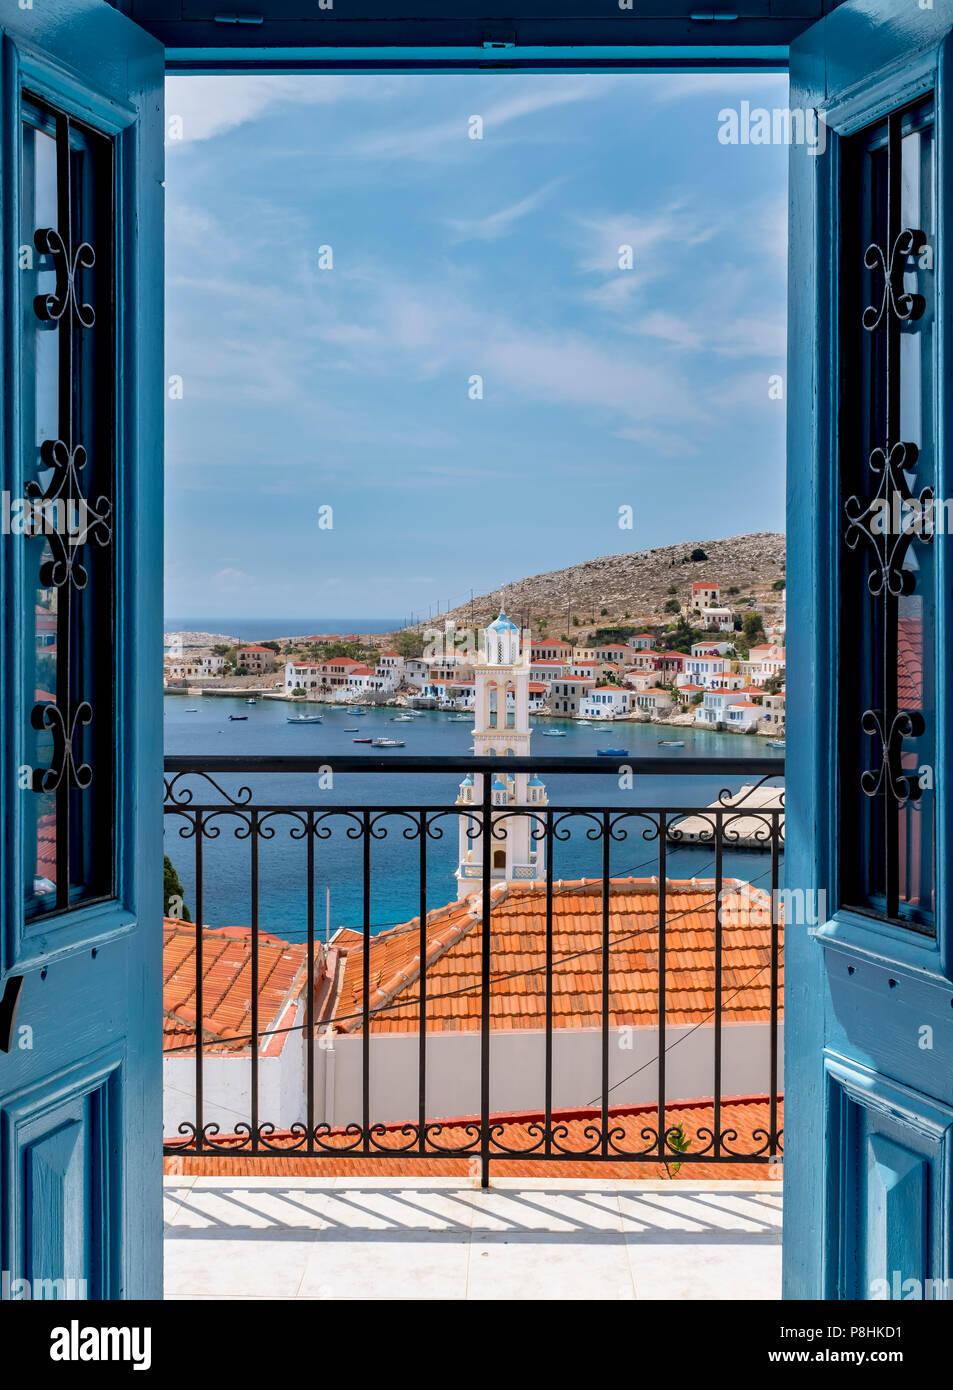 The best view of Halki harbor through a blue wooden door frame. - Stock Image